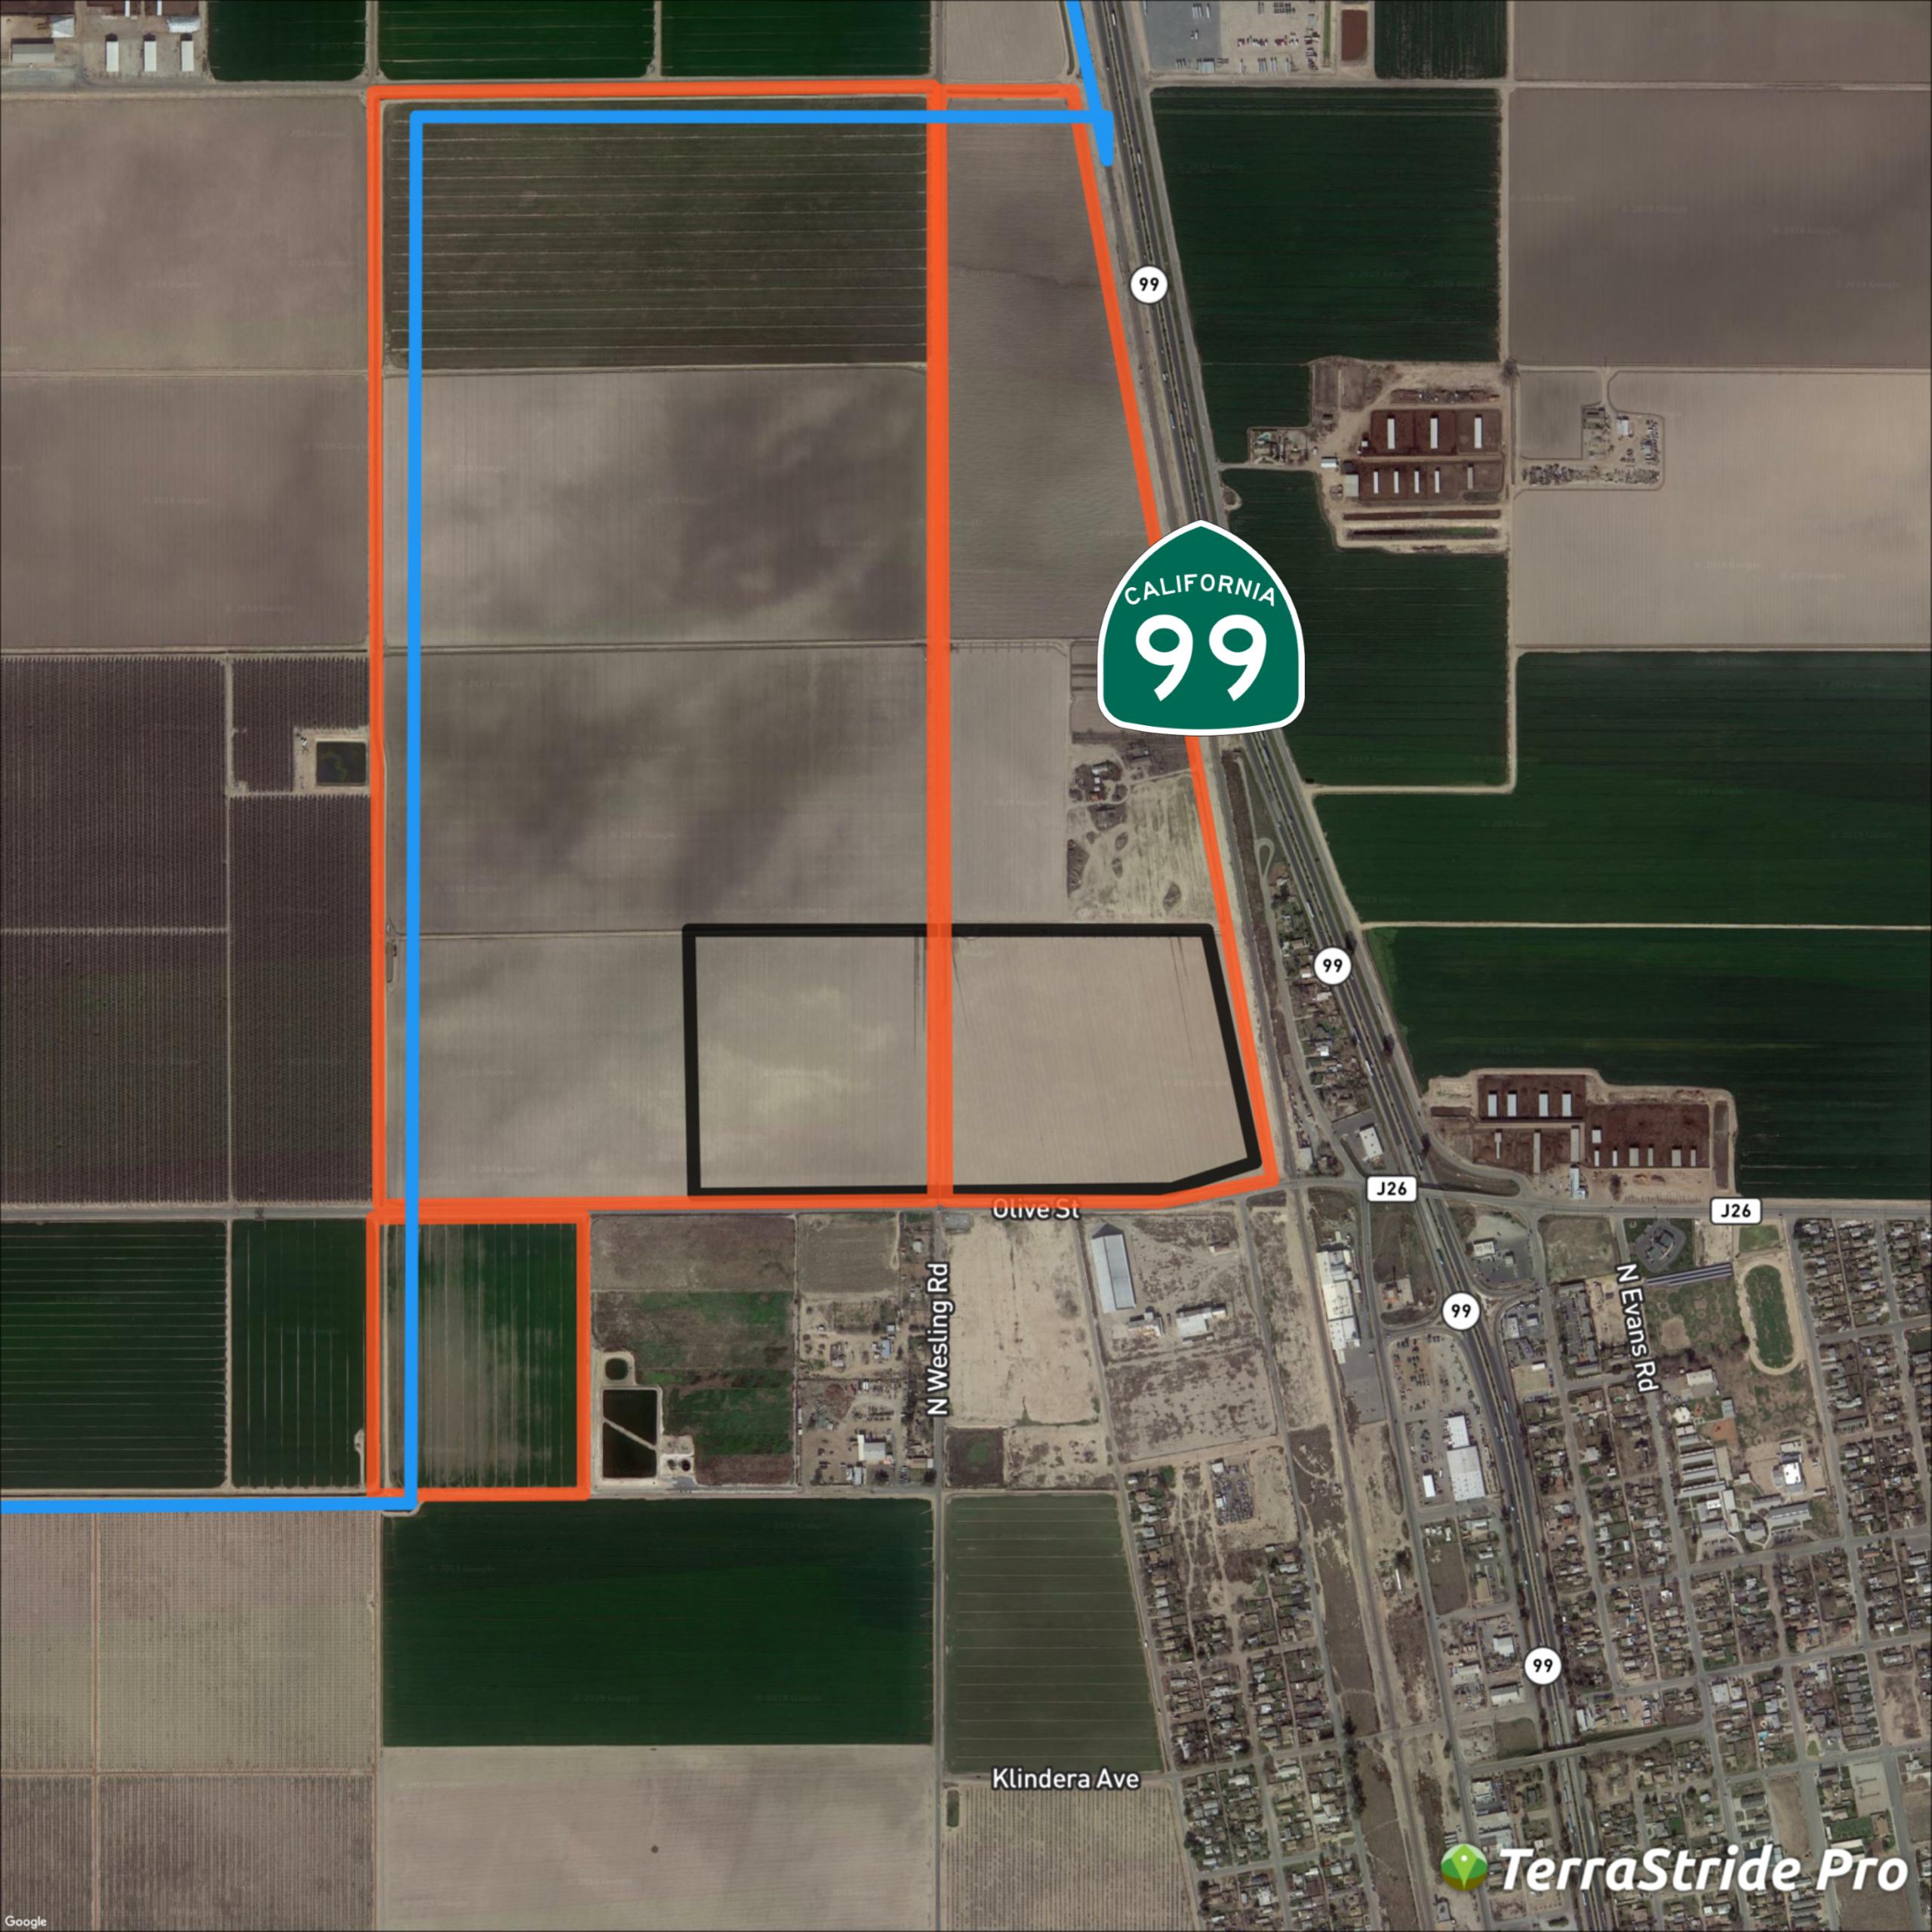 478.17 Ac. Open Farm Ground